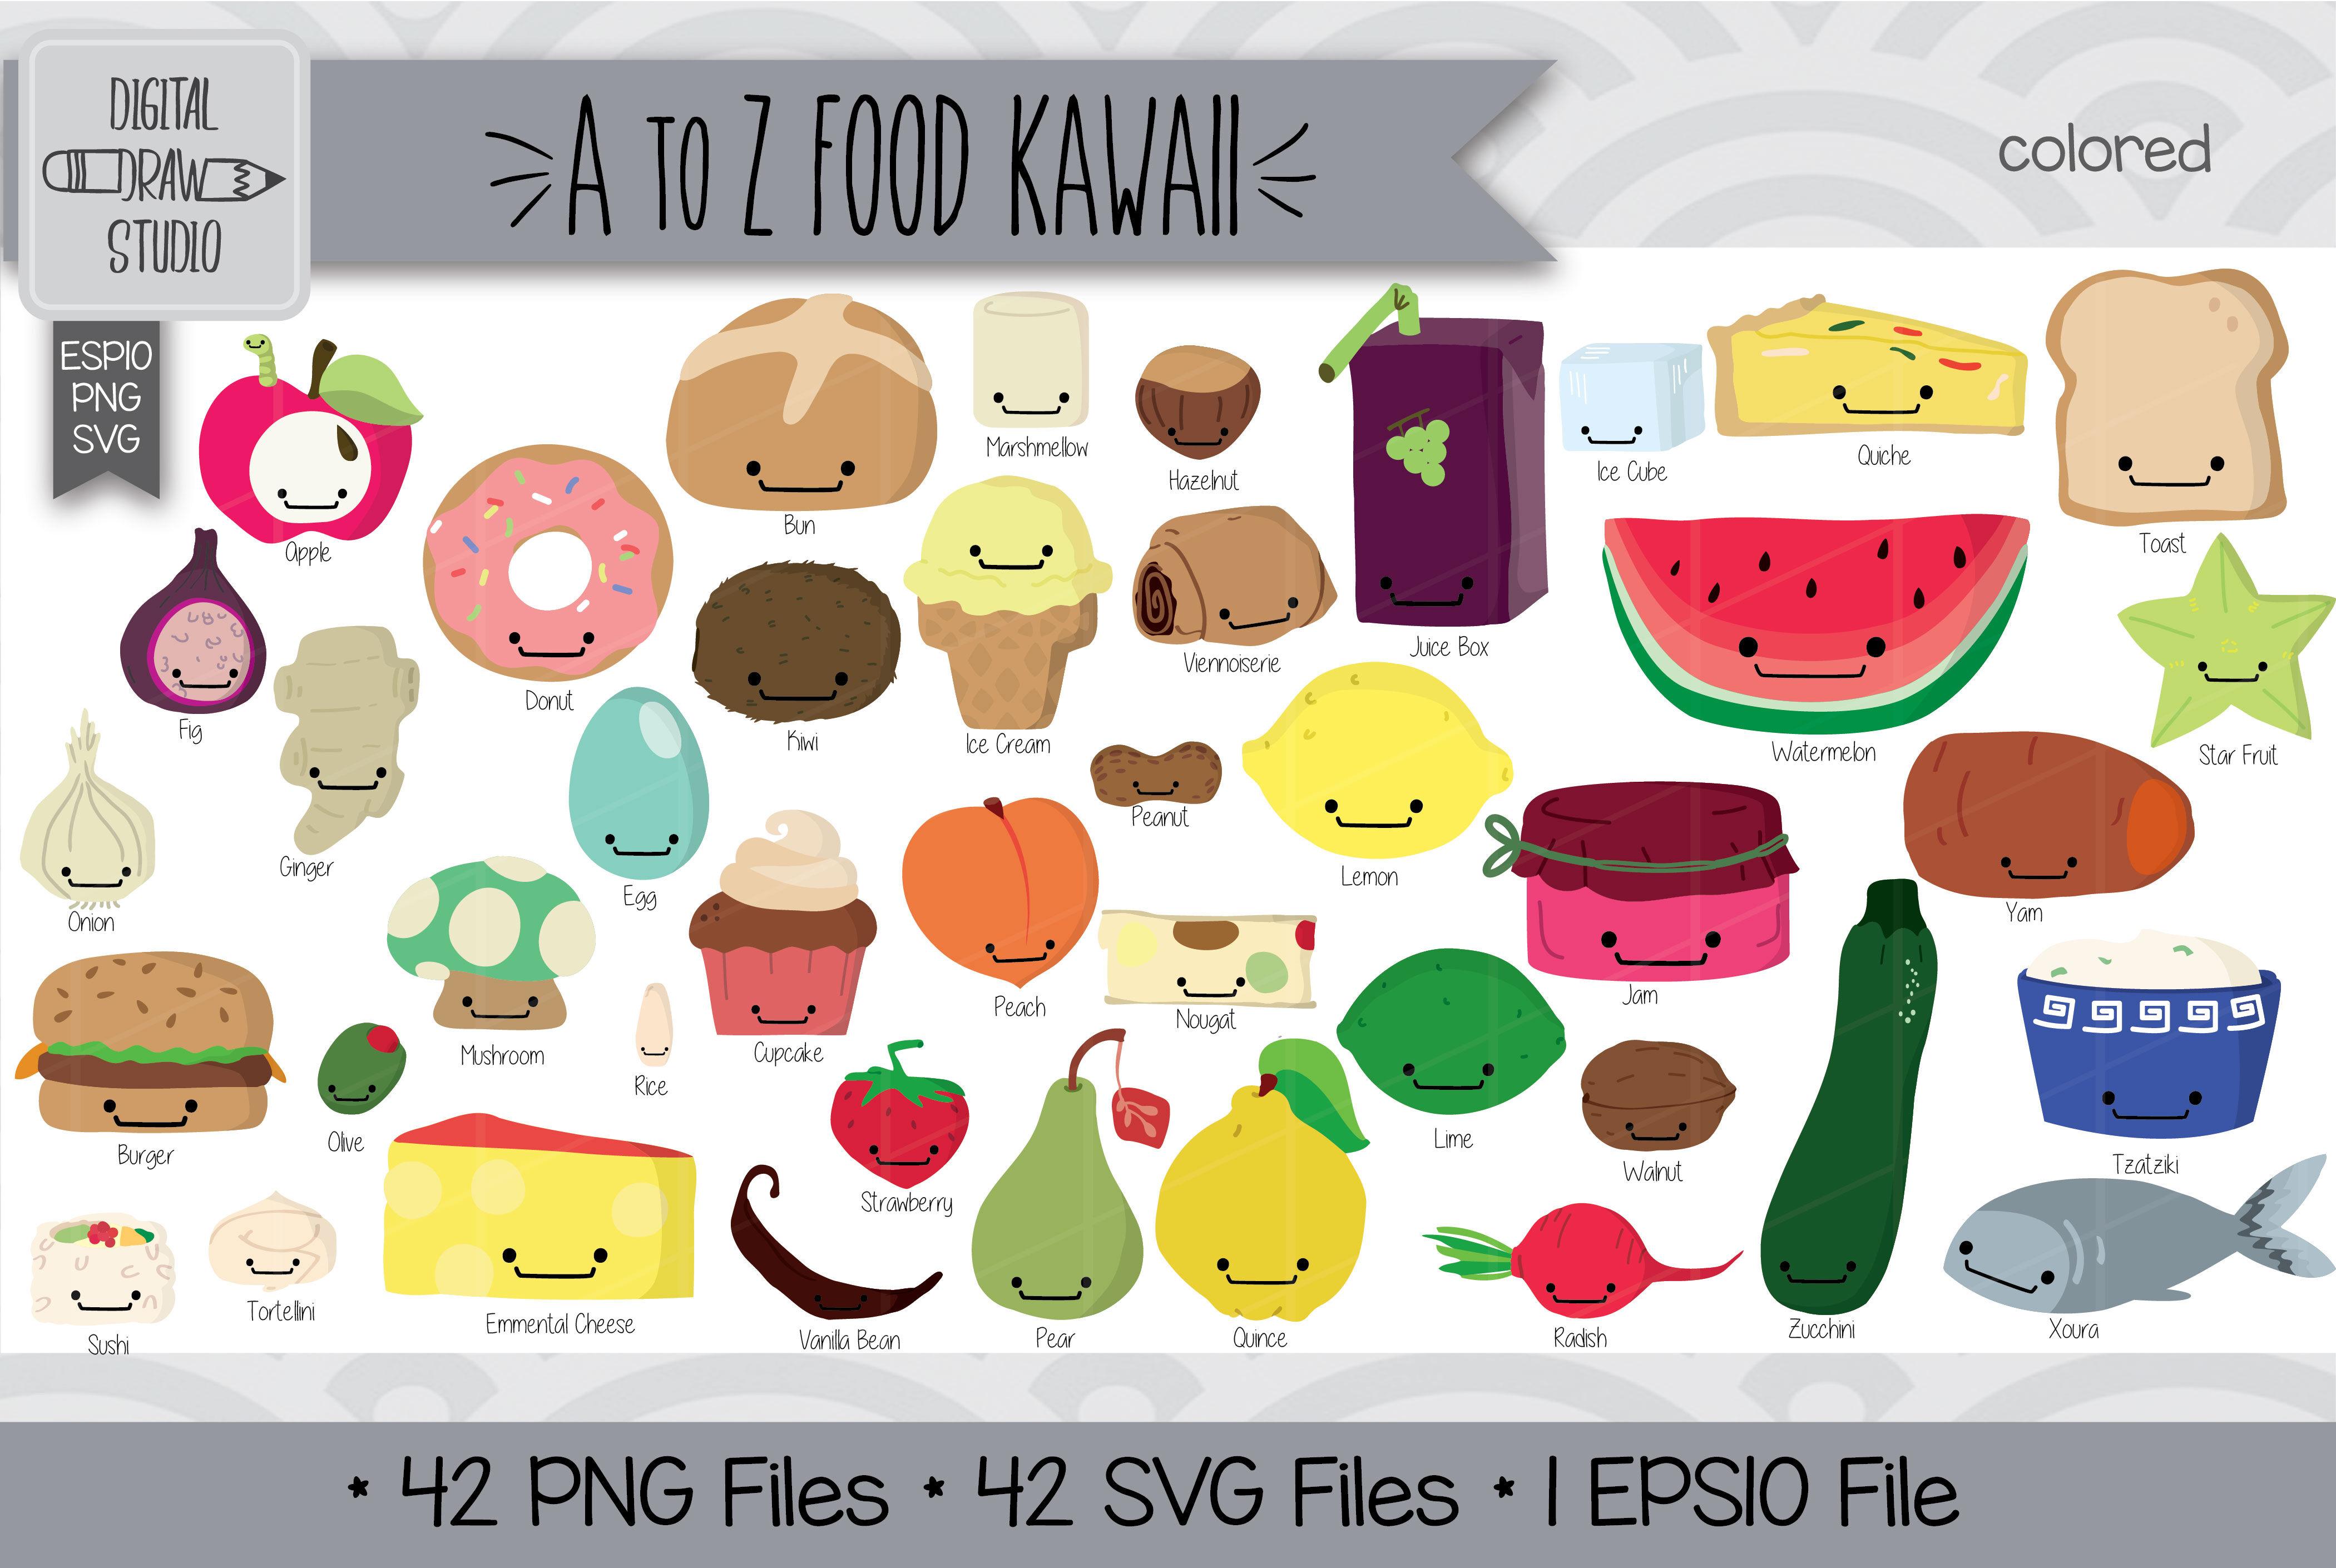 Hand Drawn Cute Fruit Vegetable Illustration Bundle Sweets Savory Vector Graphics 42 Food Kawaii Colored Clip Art Png Eps Pdf Svg